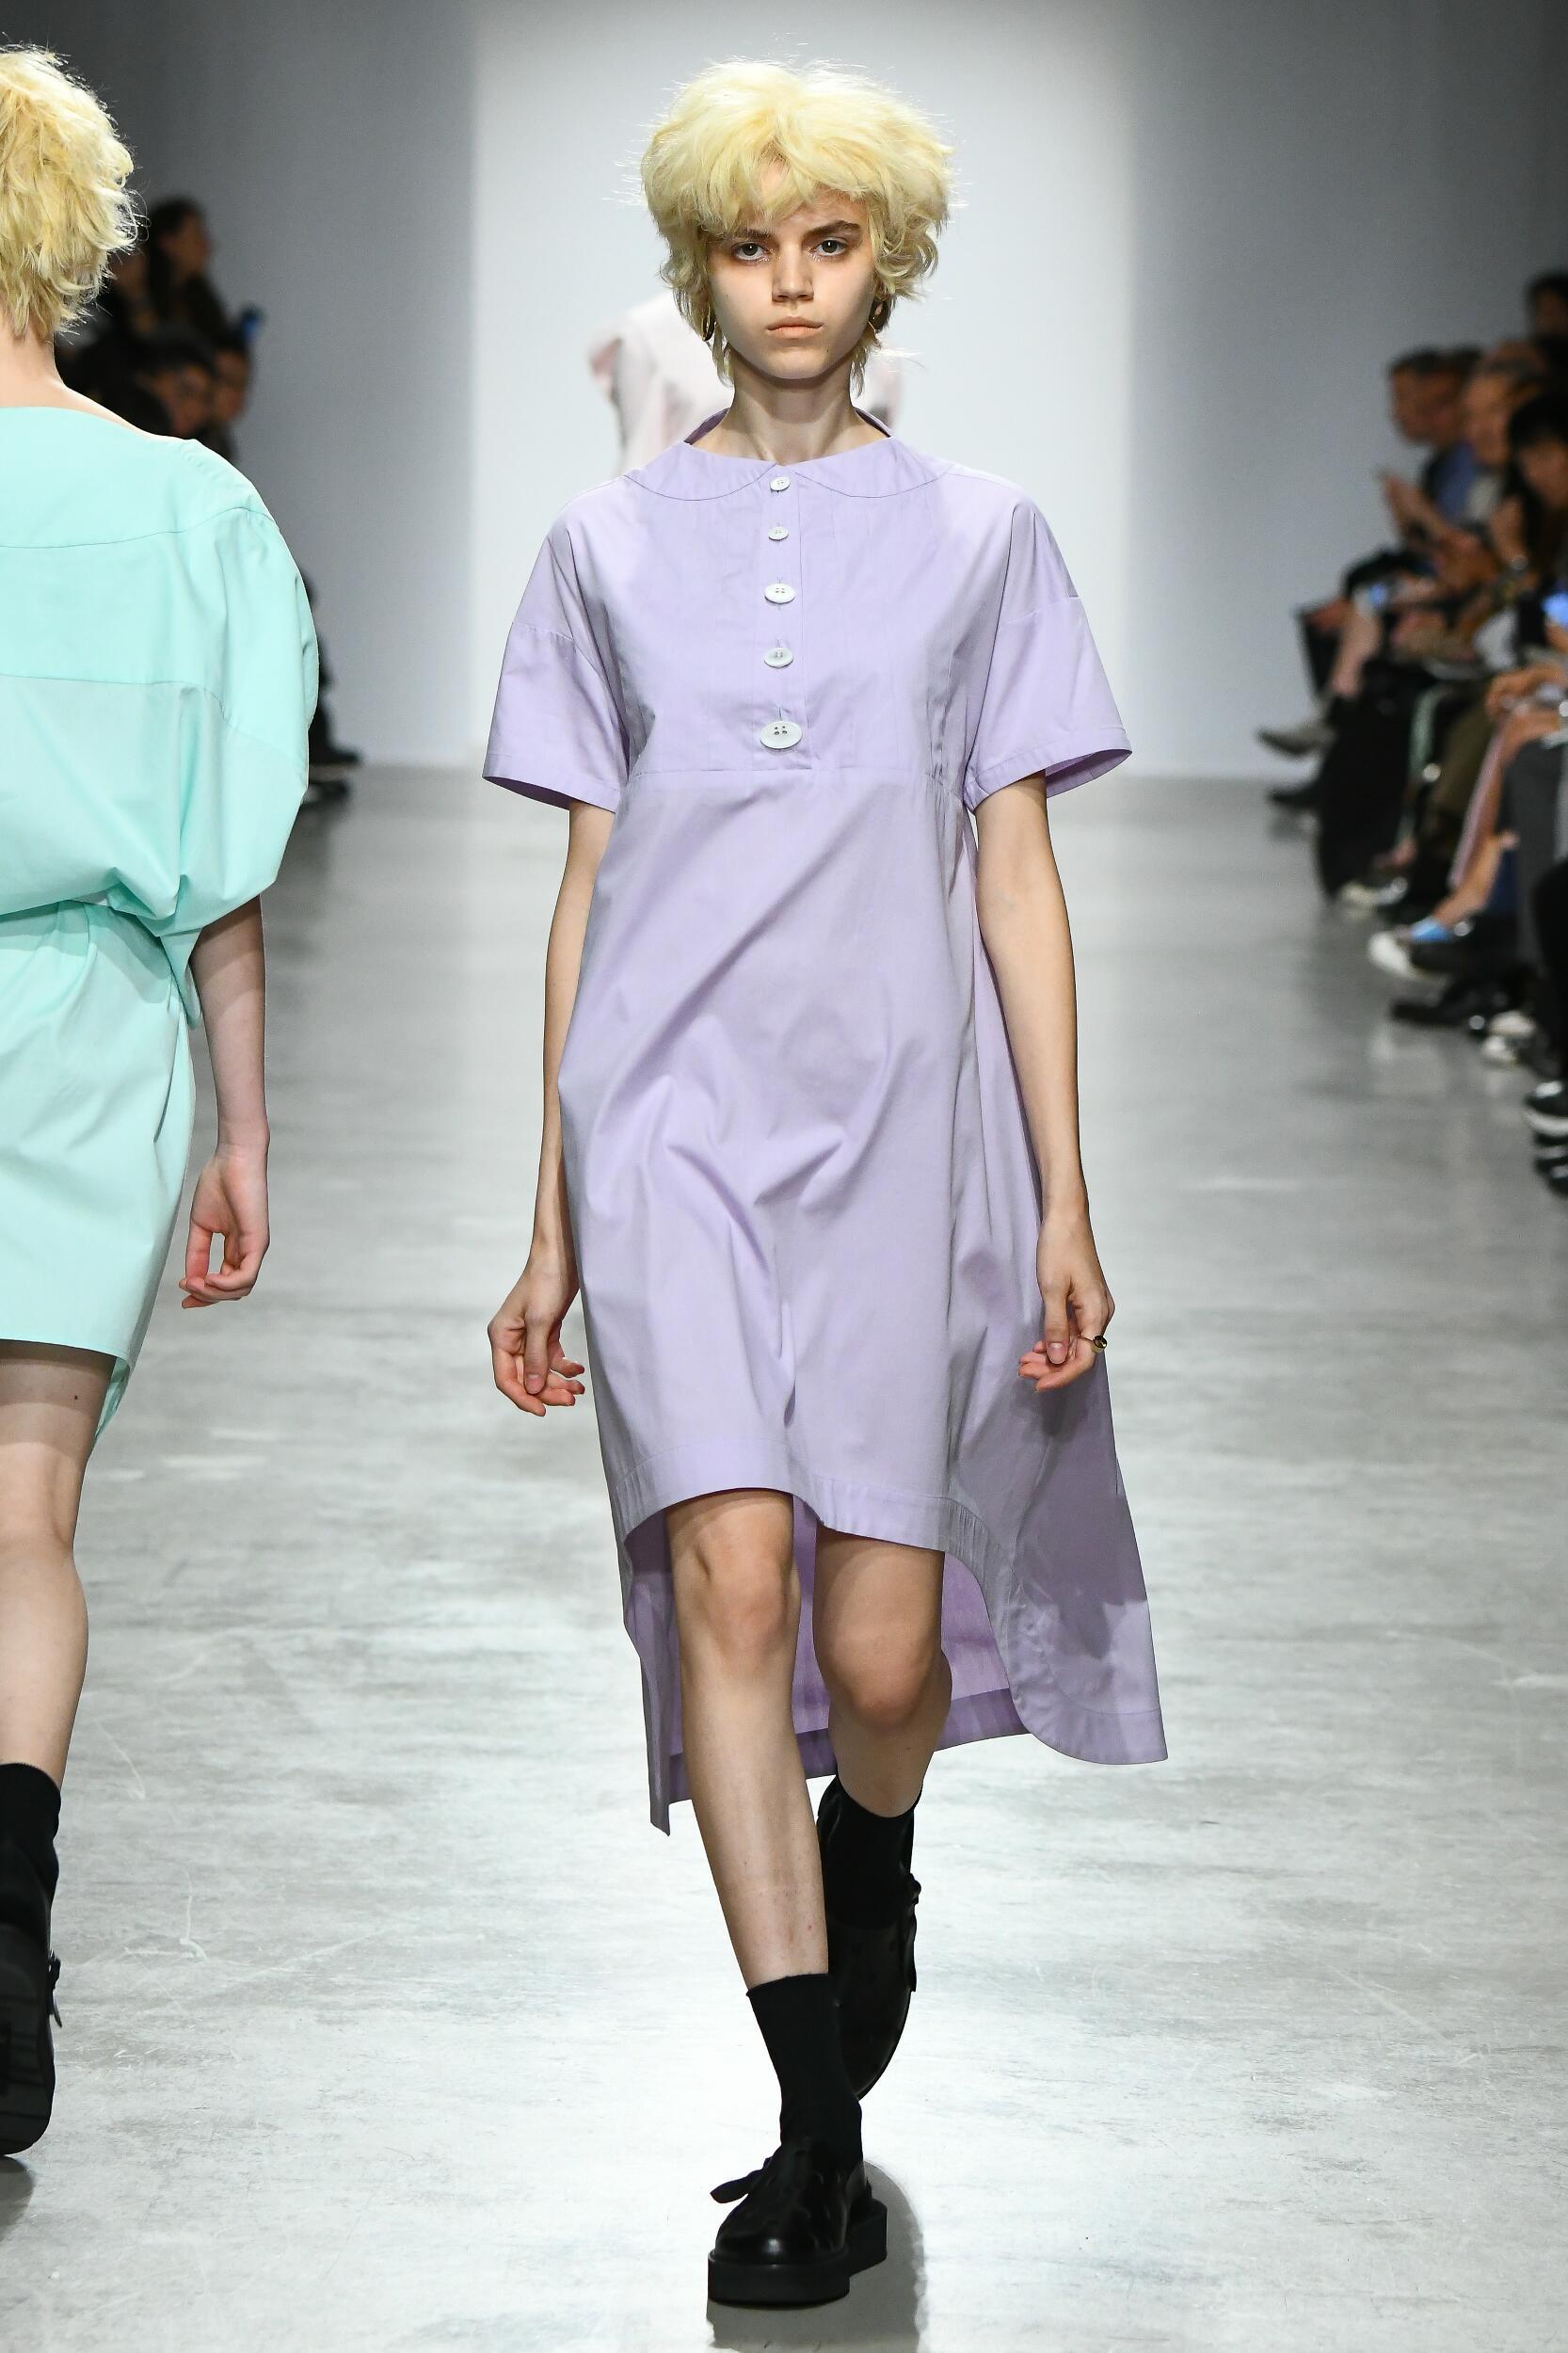 Fashion Model Woman Anrealage Catwalk